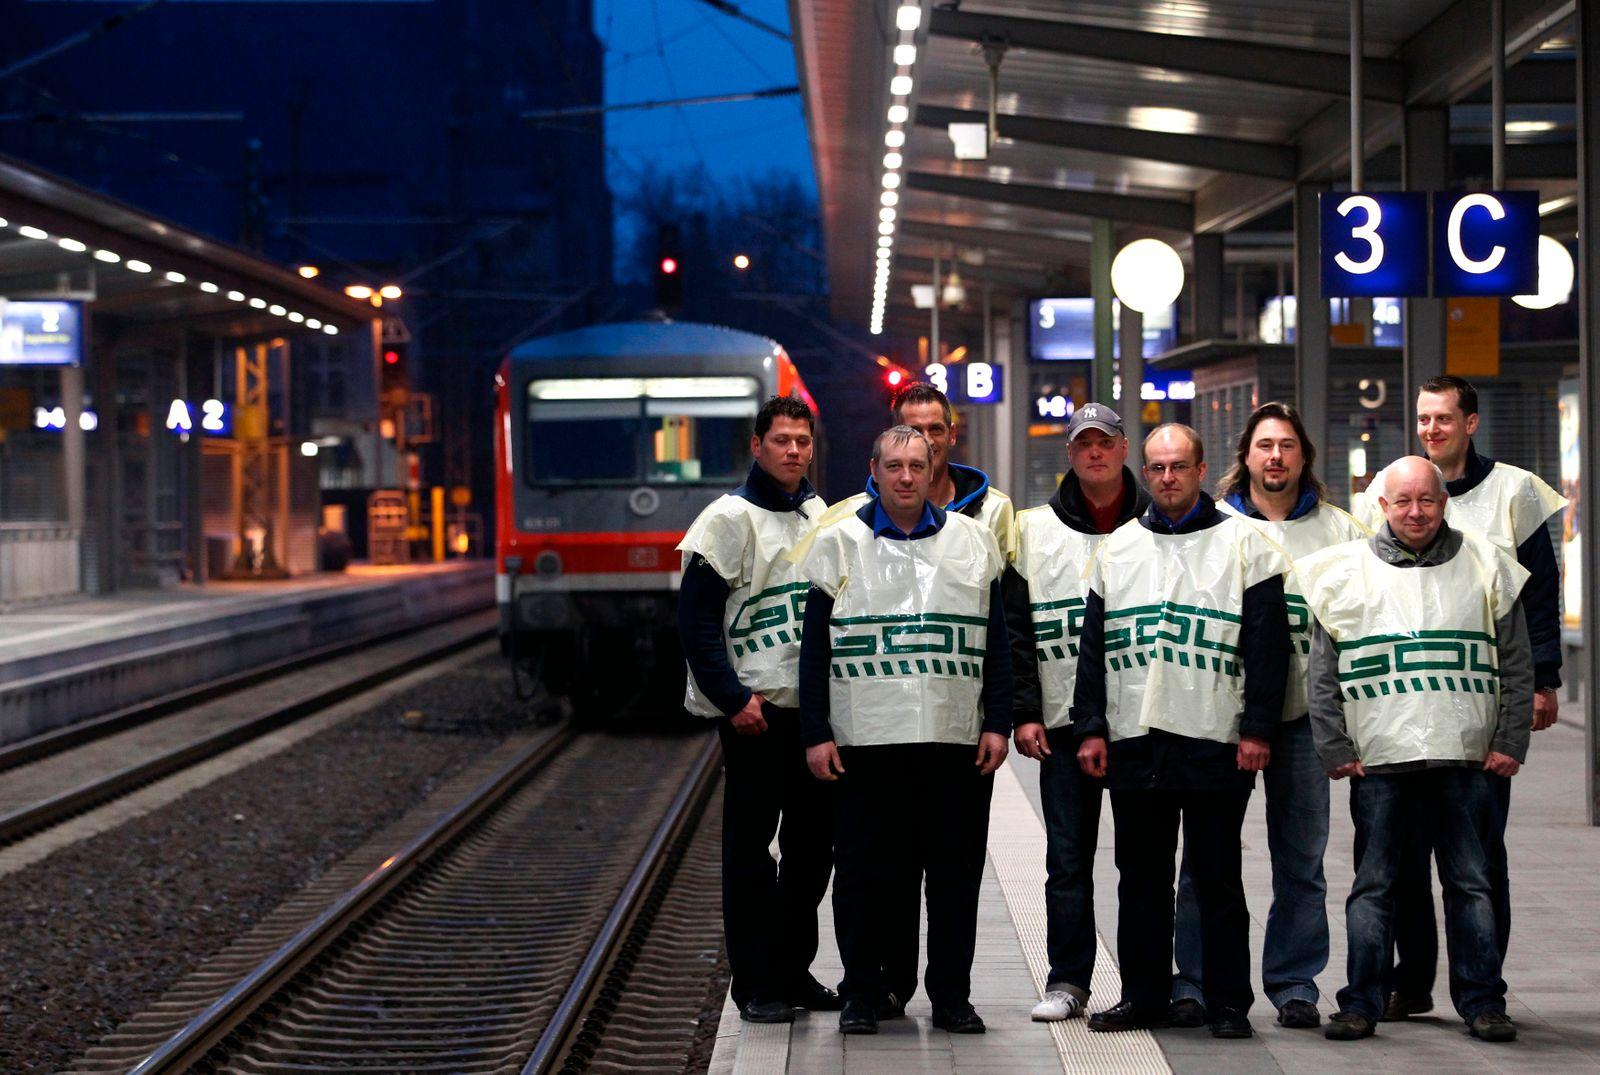 Bahnstreik / Bahn / Lokführer streiken